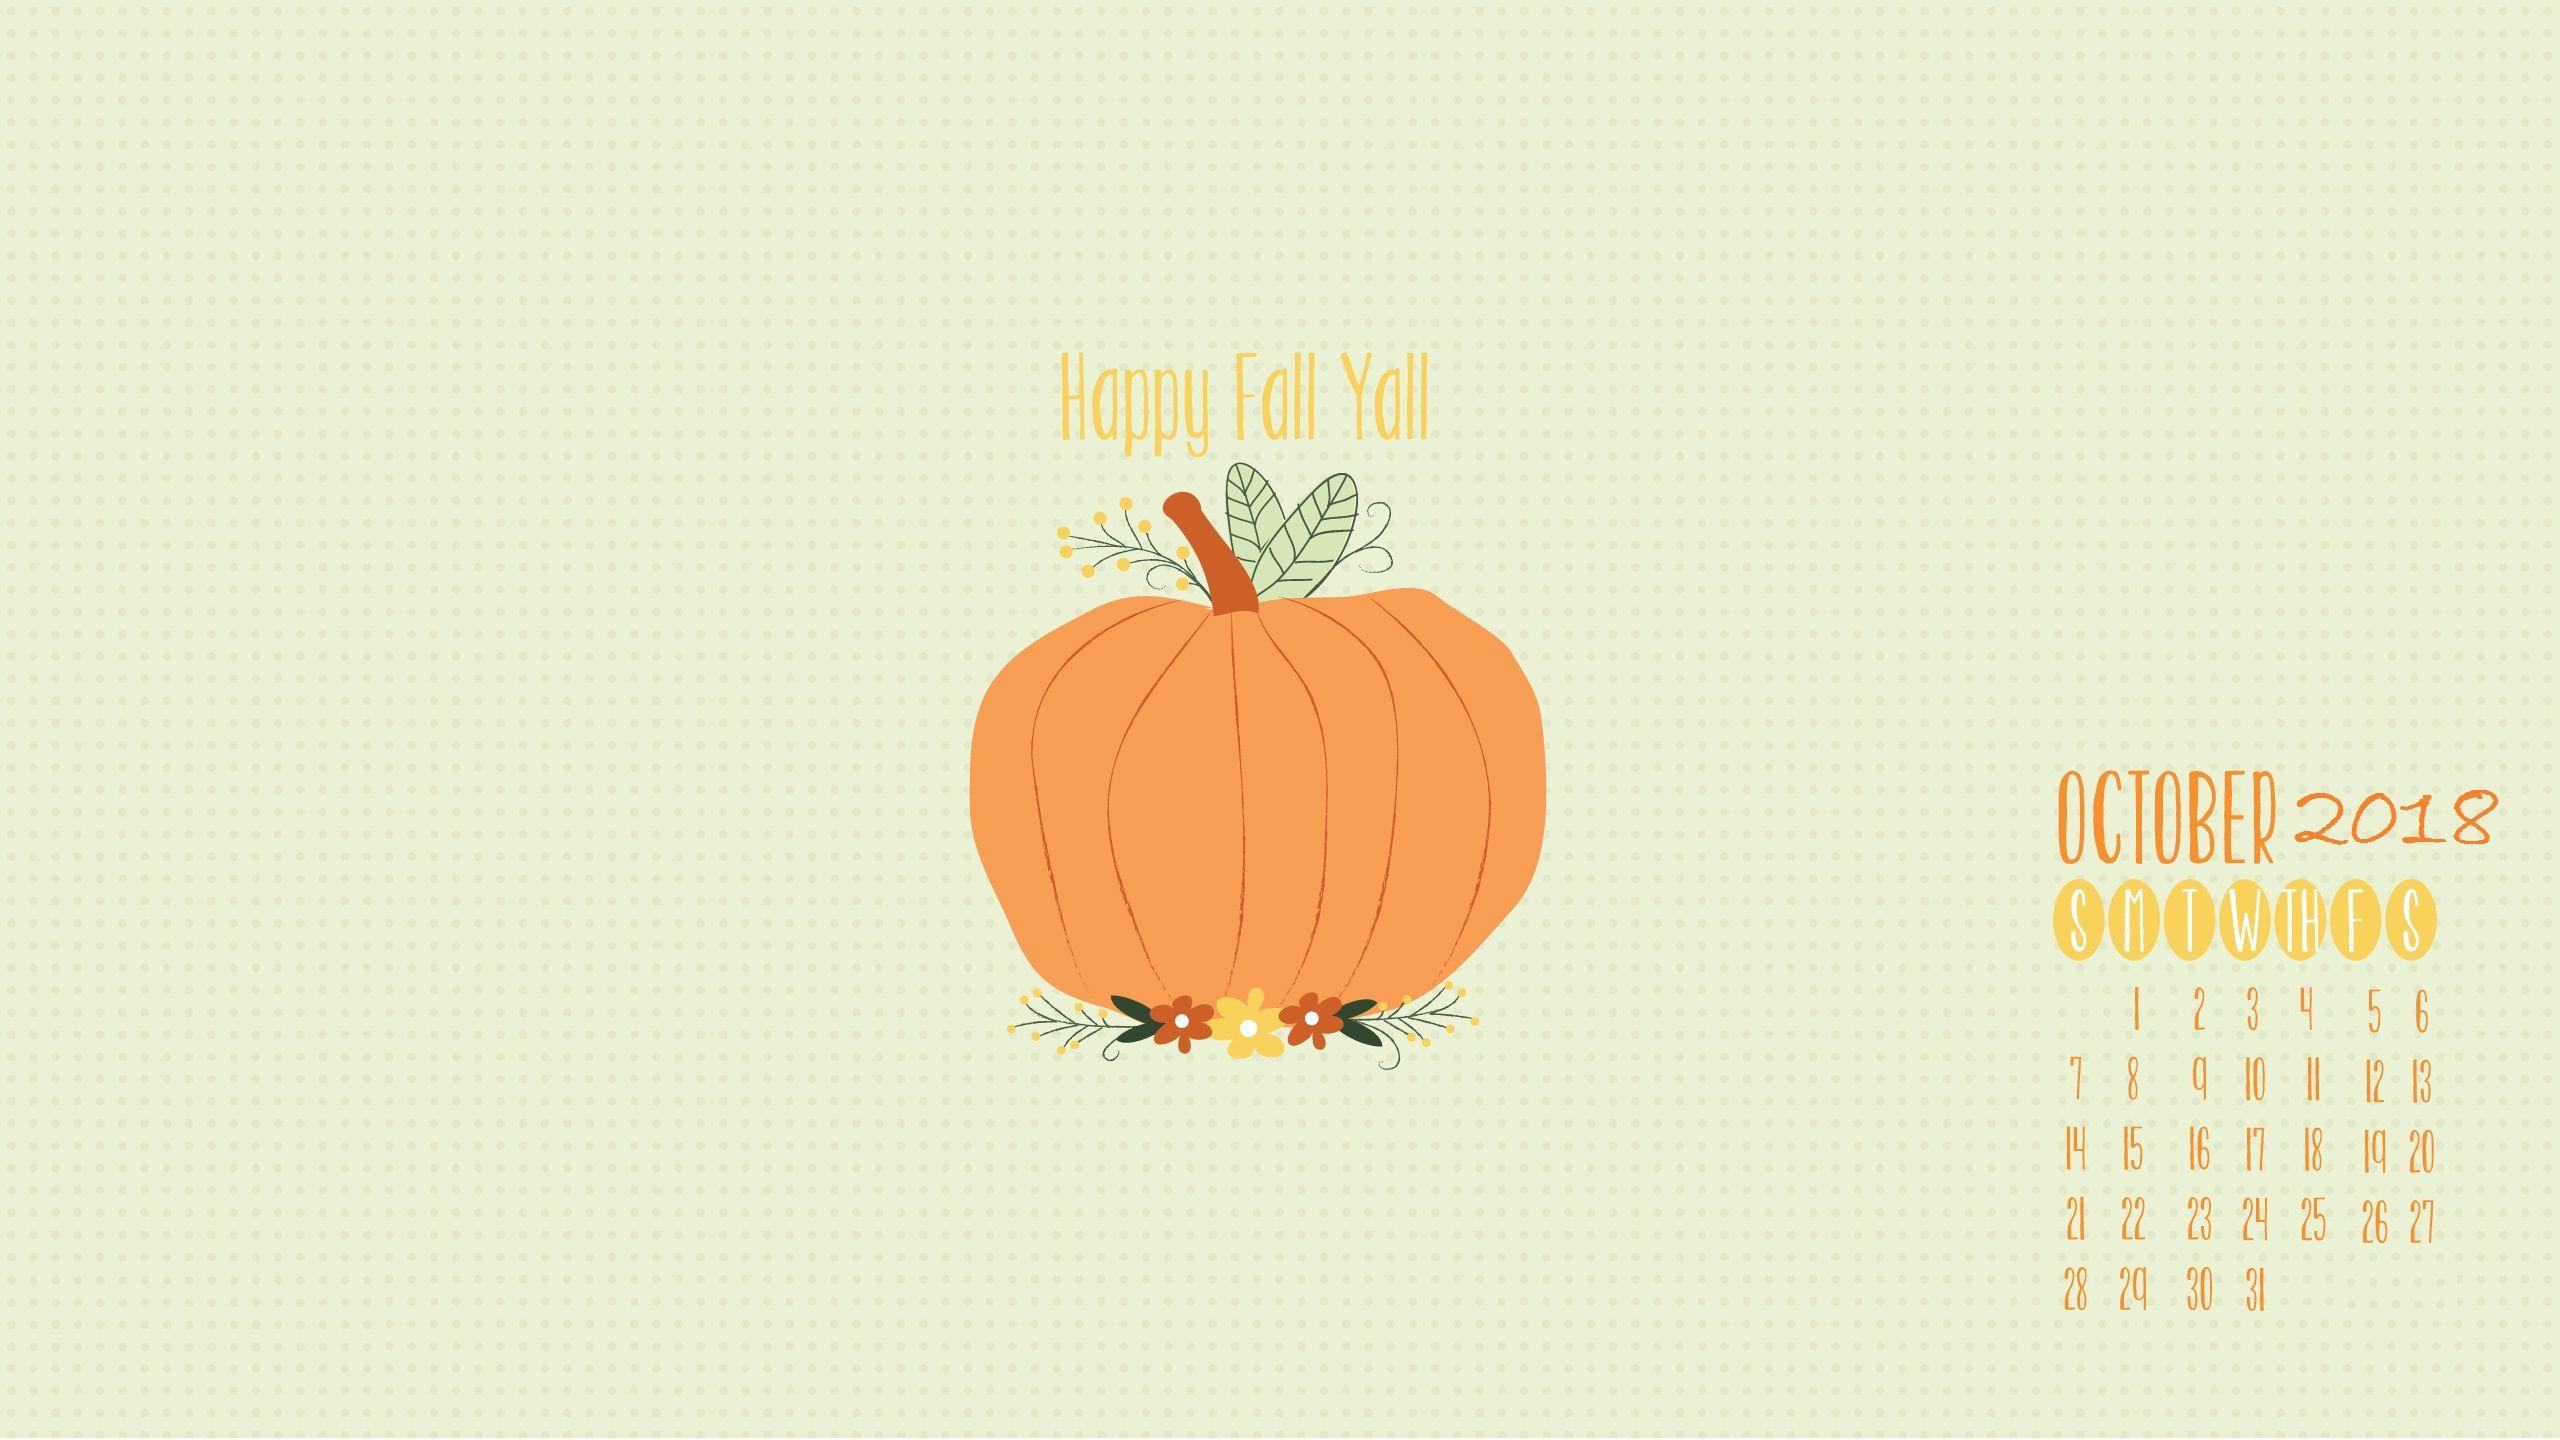 October Desktop Background 2018 Calendar wallpaper